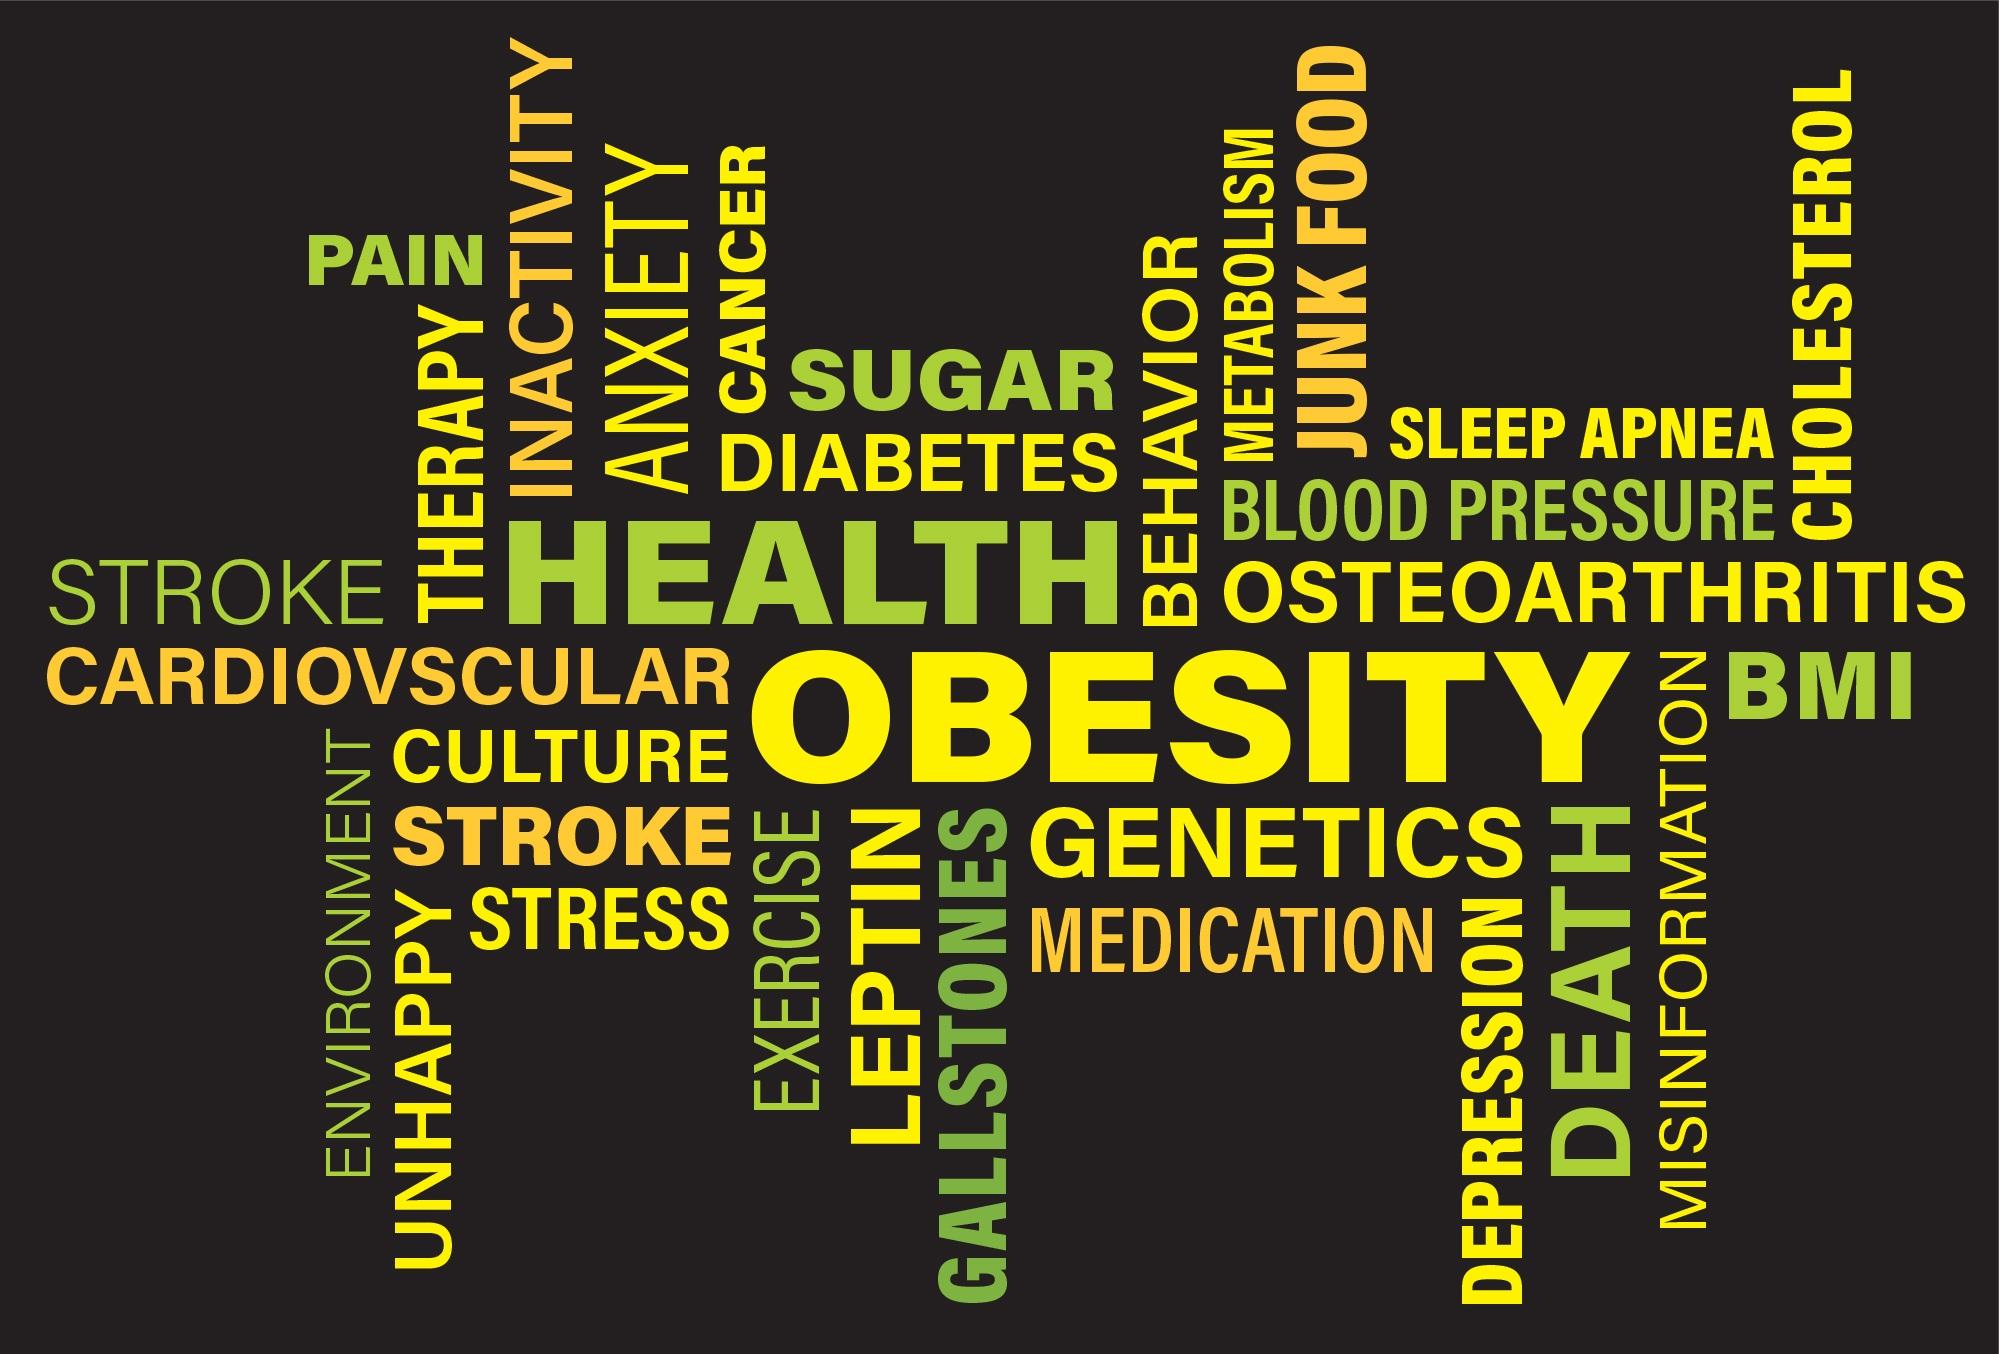 obesity-3217137.jpg